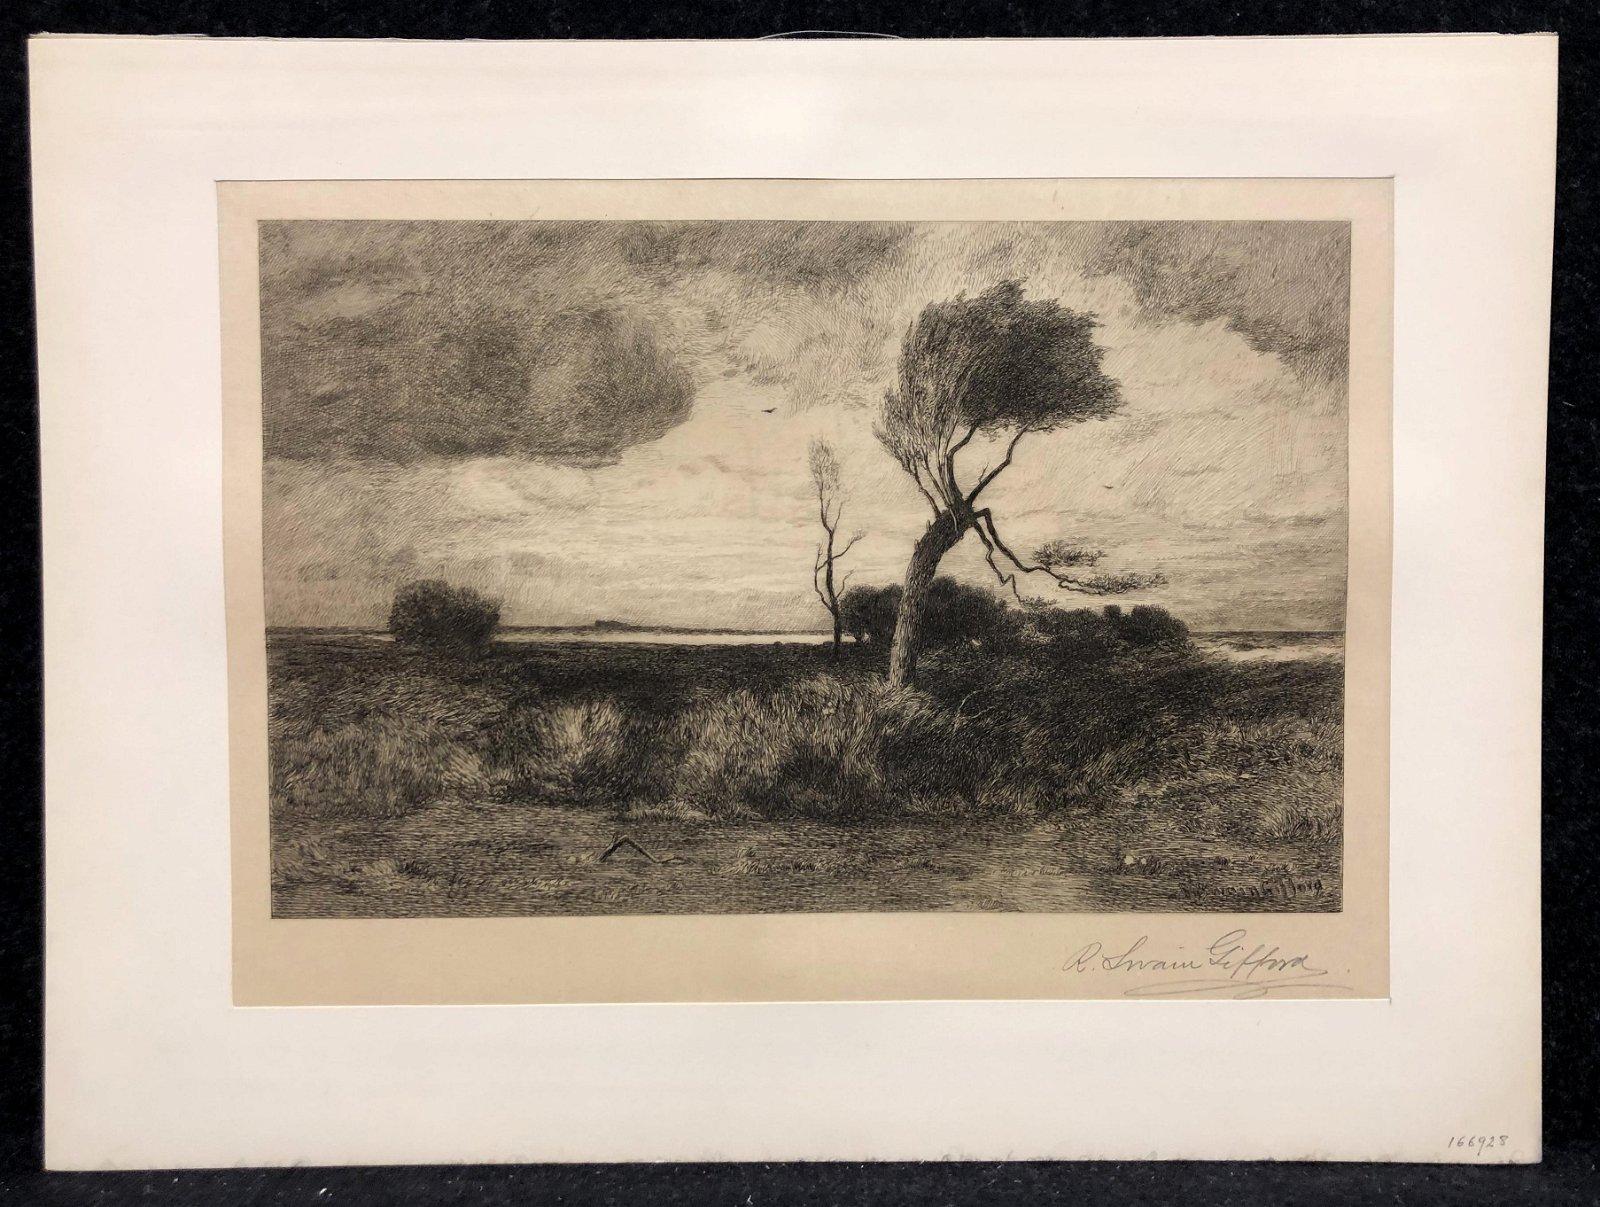 Artist: Robert Swain Gifford (American, 1840-1909